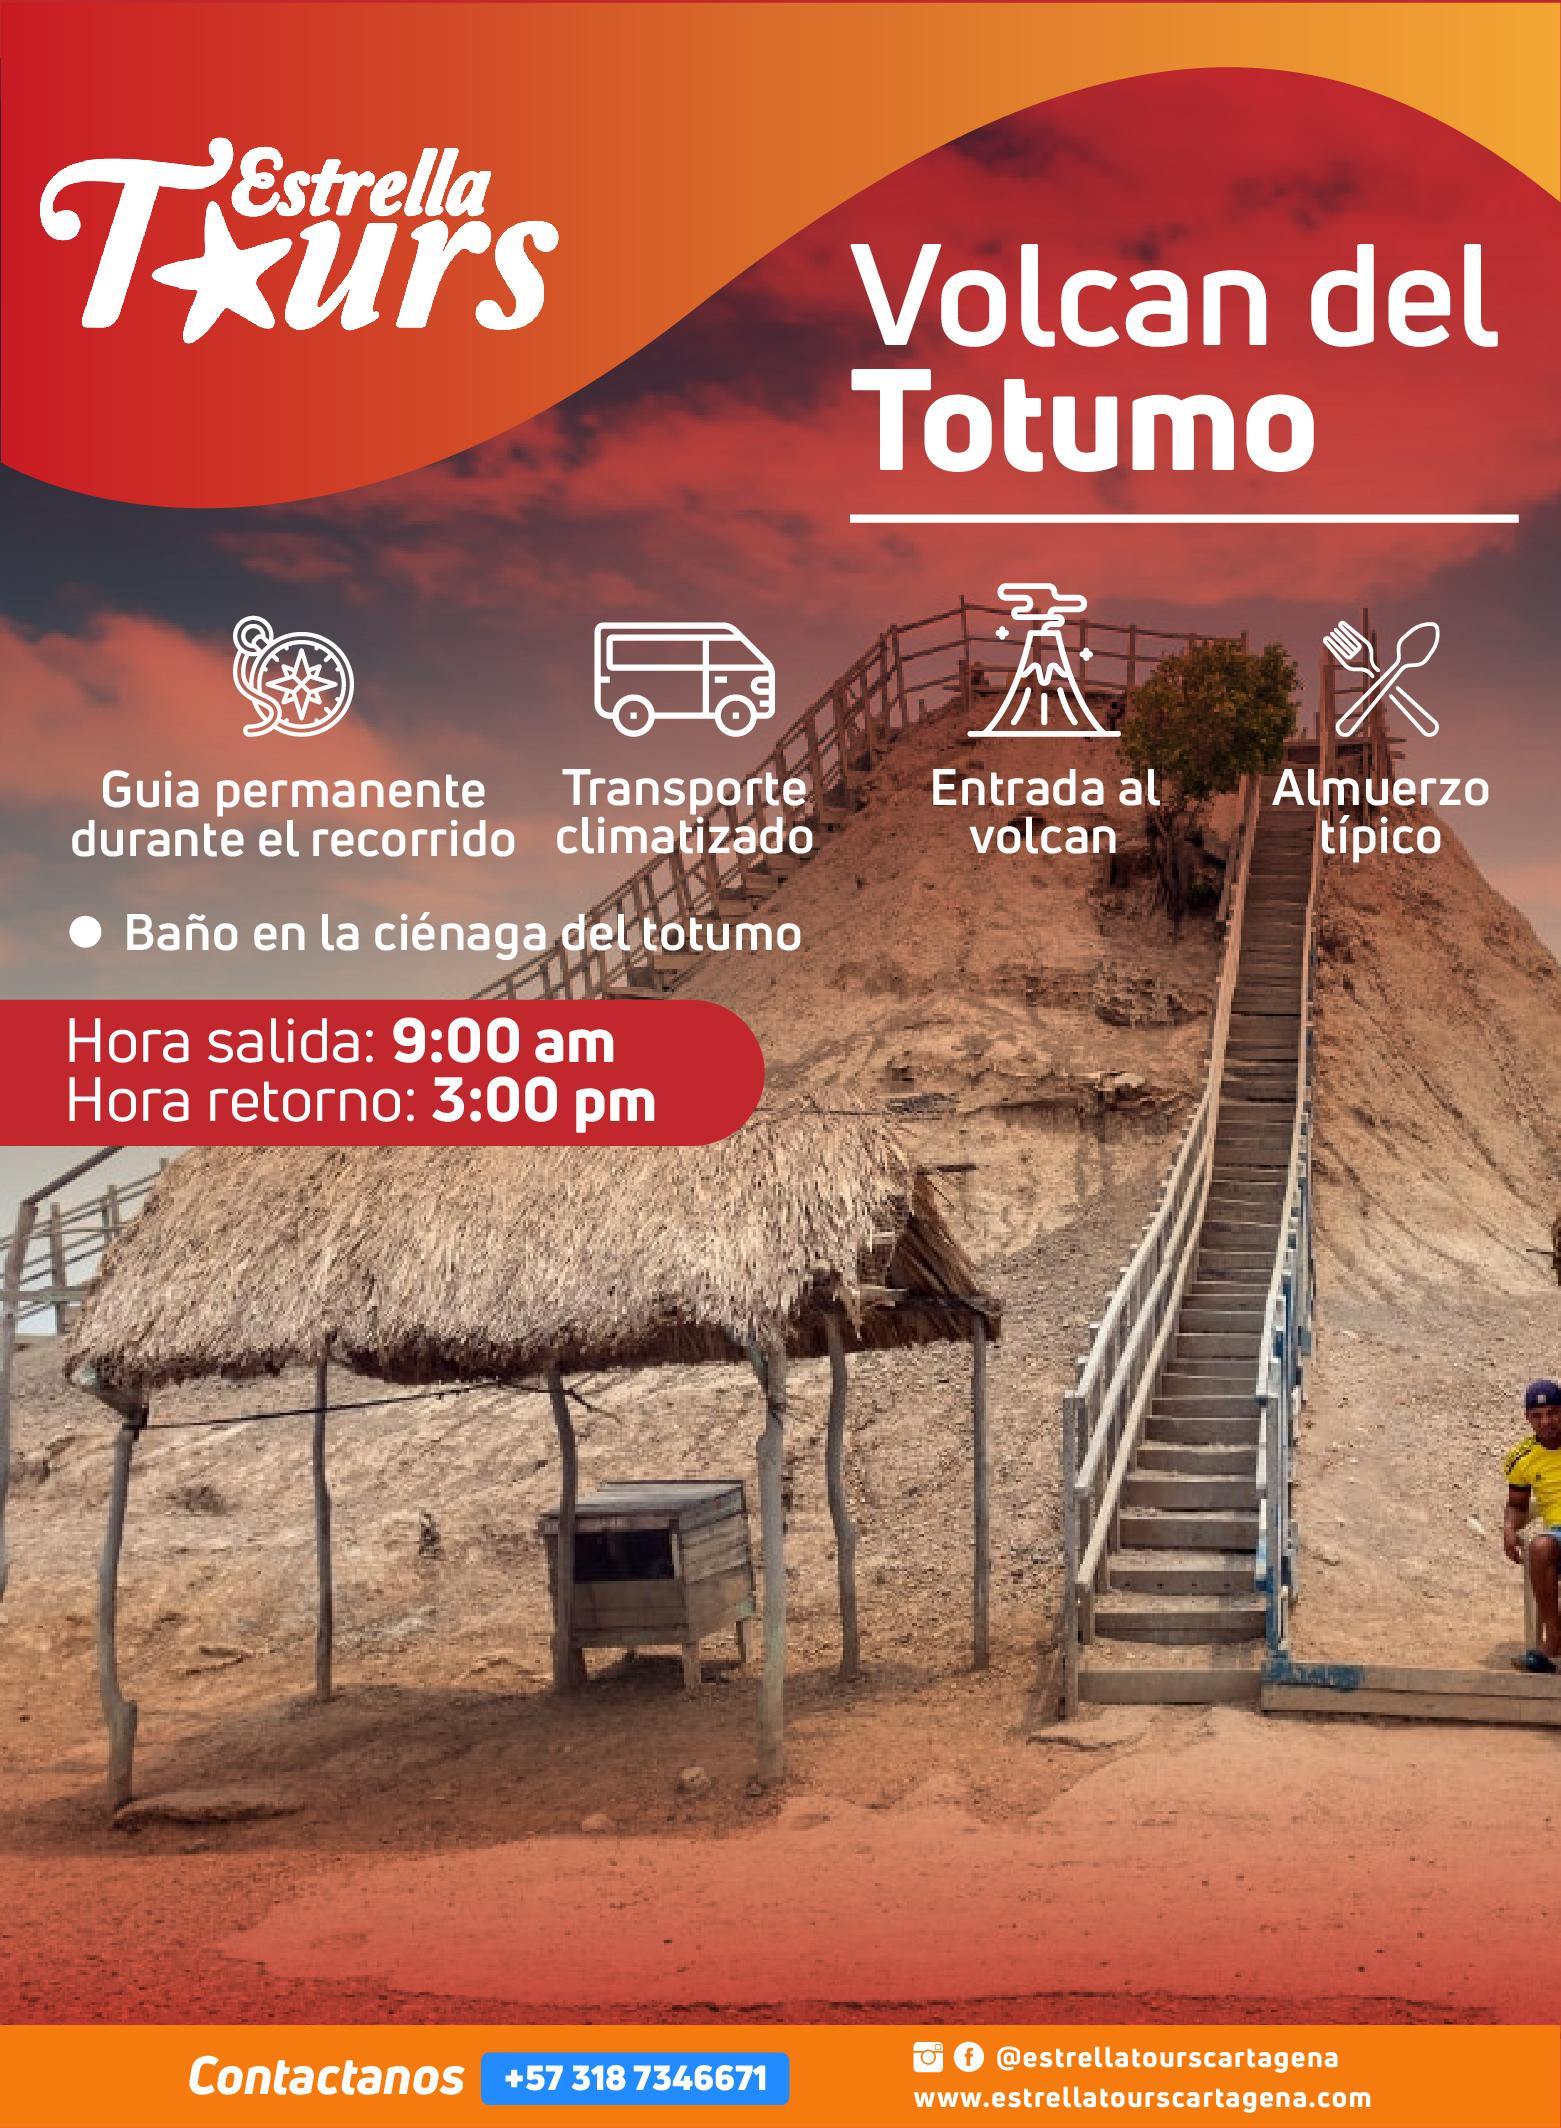 Tour_volcan del totumo